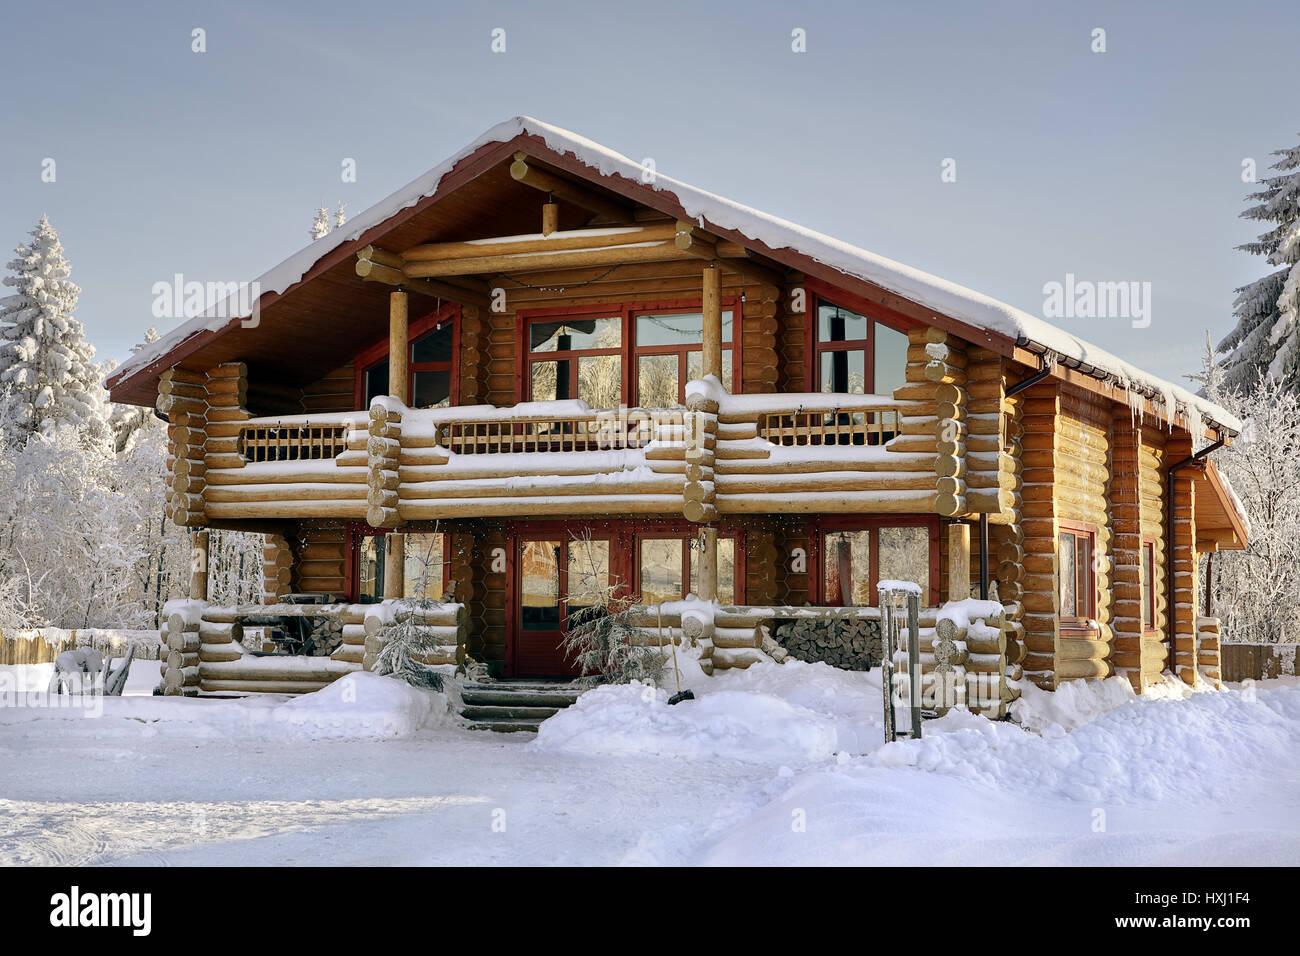 moderne blockhaus ferienhaus aus holz winter holz haus. Black Bedroom Furniture Sets. Home Design Ideas